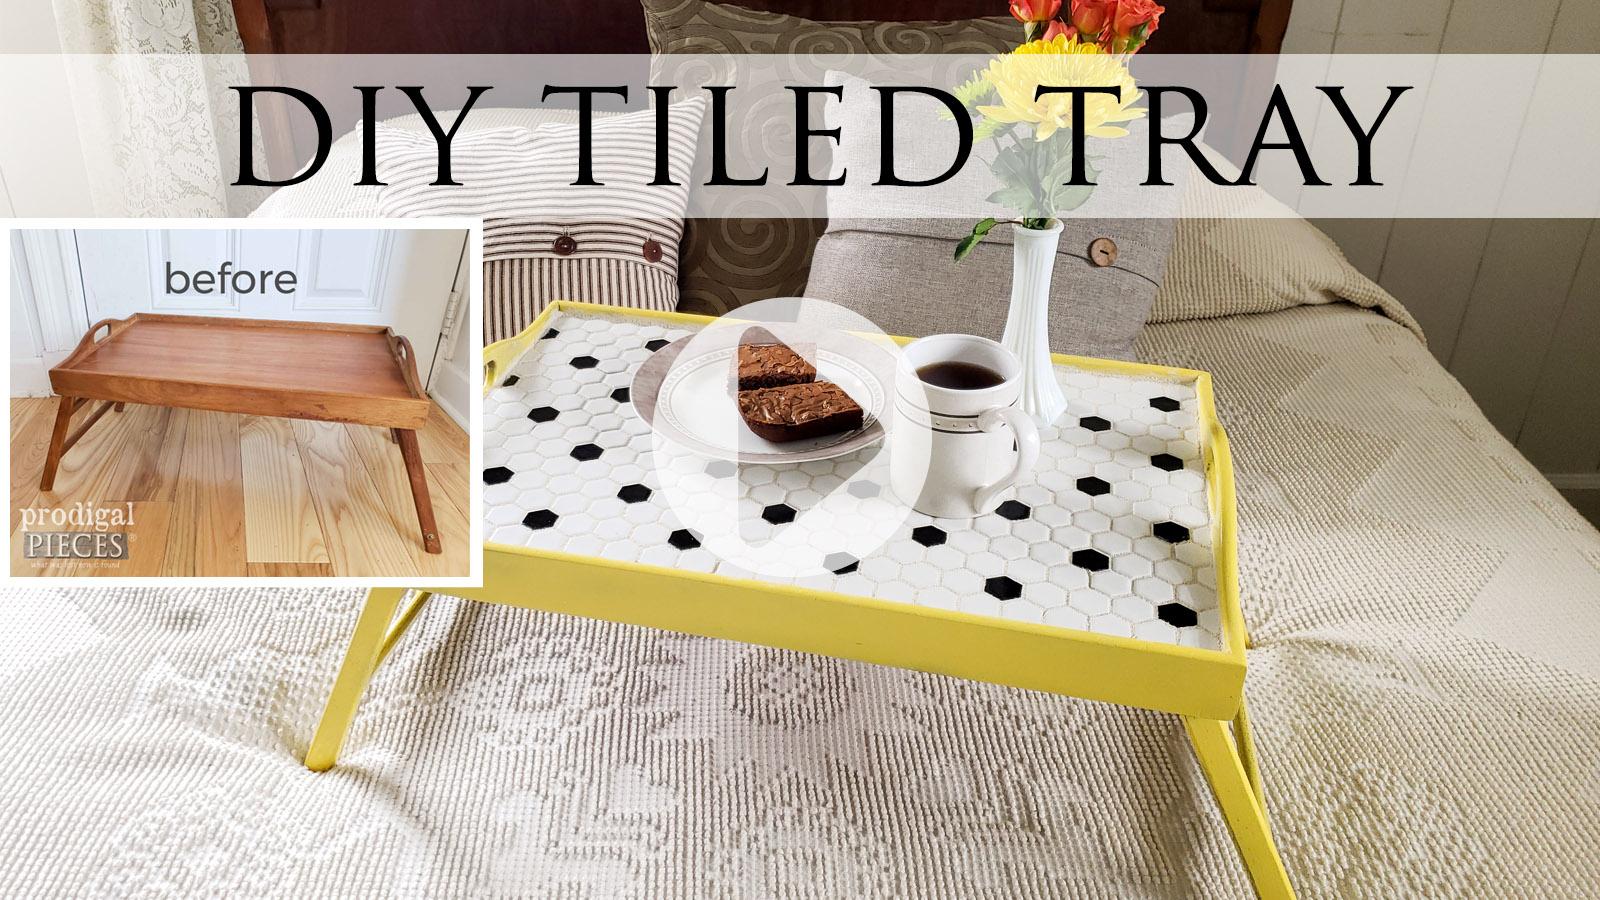 DIY Tiled Tray Video Tutorial by Larissa of Prodigal Pieces   prodigalpieces.com #prodigalpieces